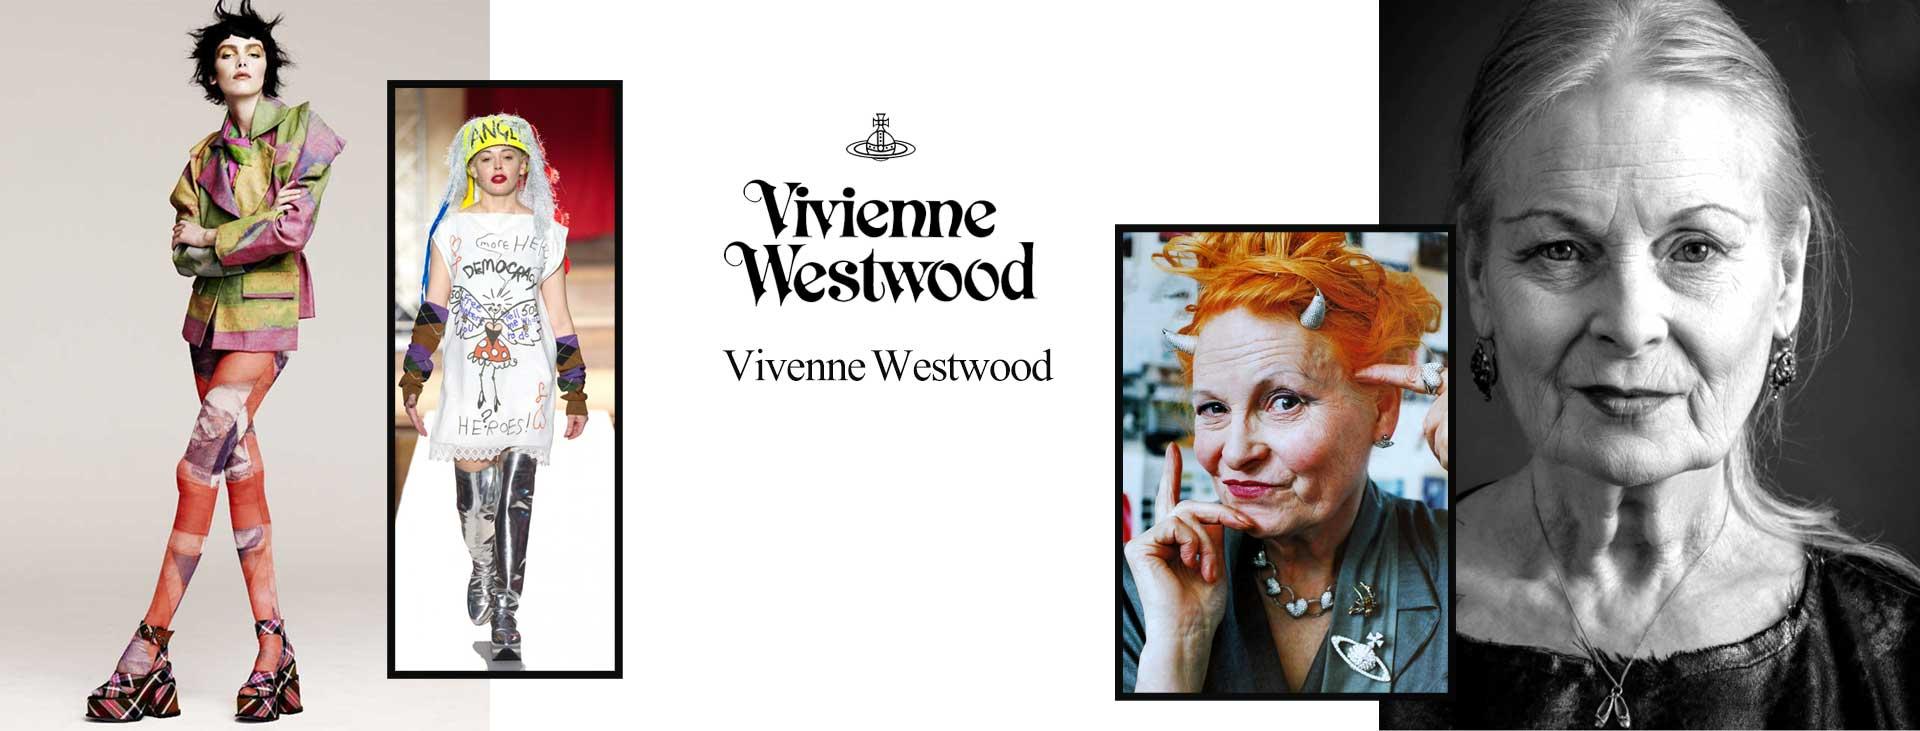 vivienne westwood 1 - زنان پیشگام در صنعت مد